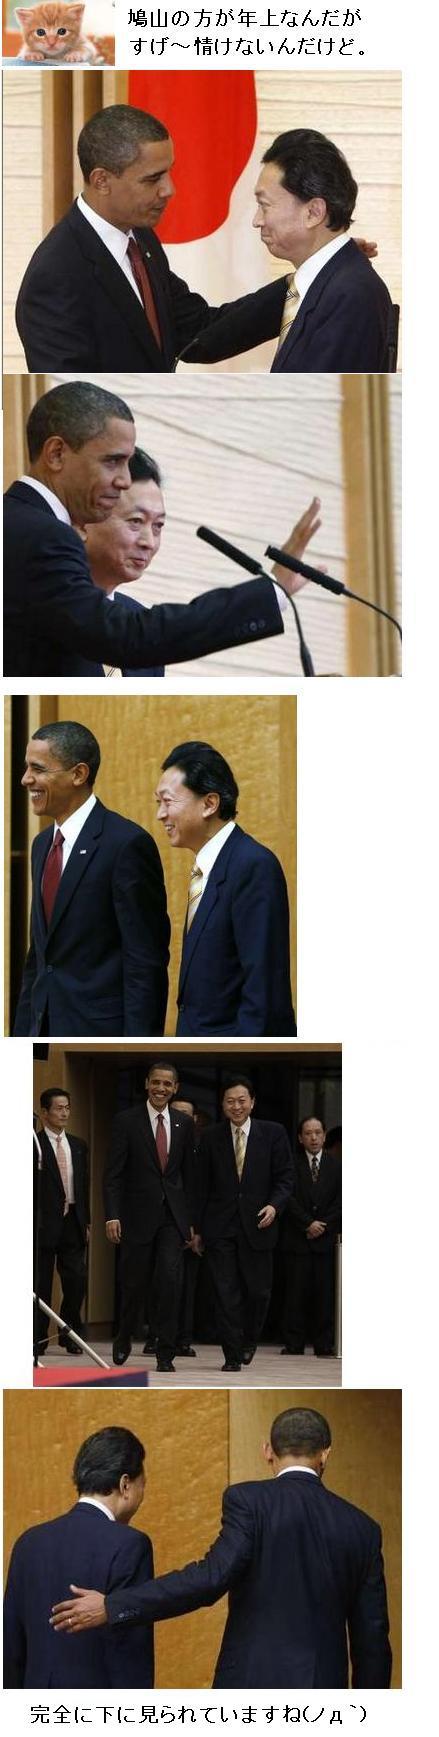 20091113OBAMATOHATO5.jpg